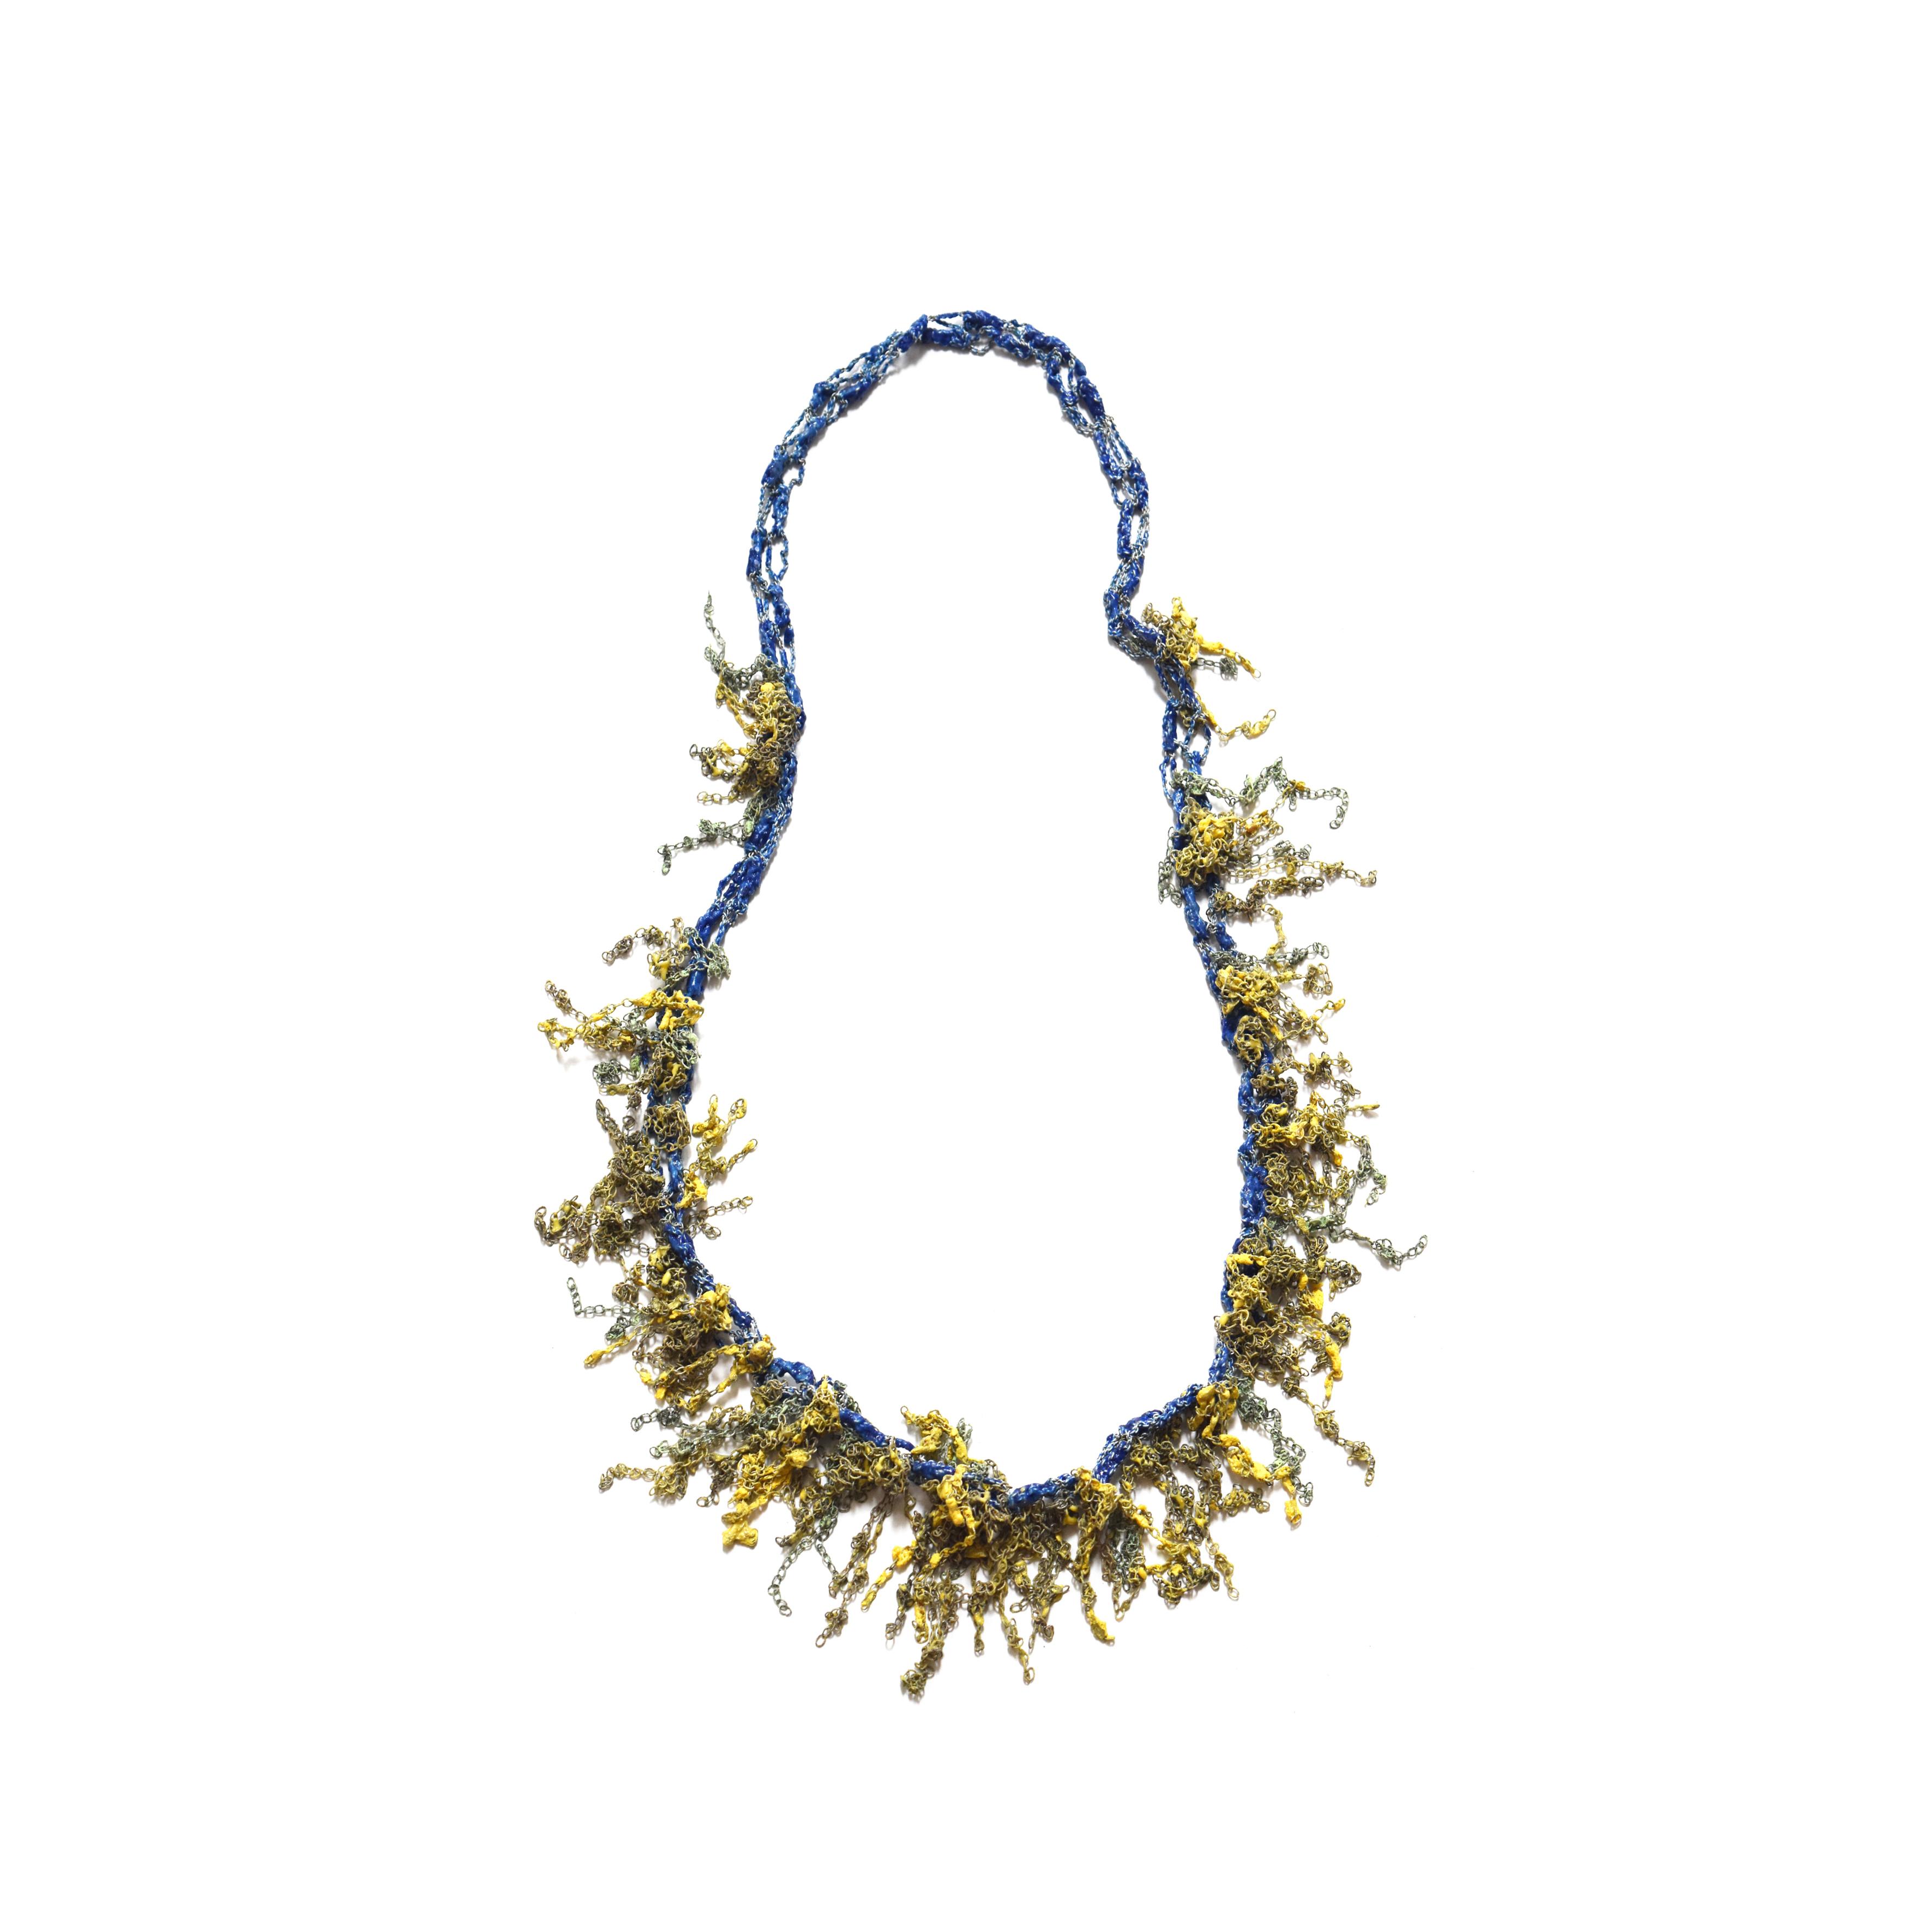 Mimosa Springtime,Necklace 2016